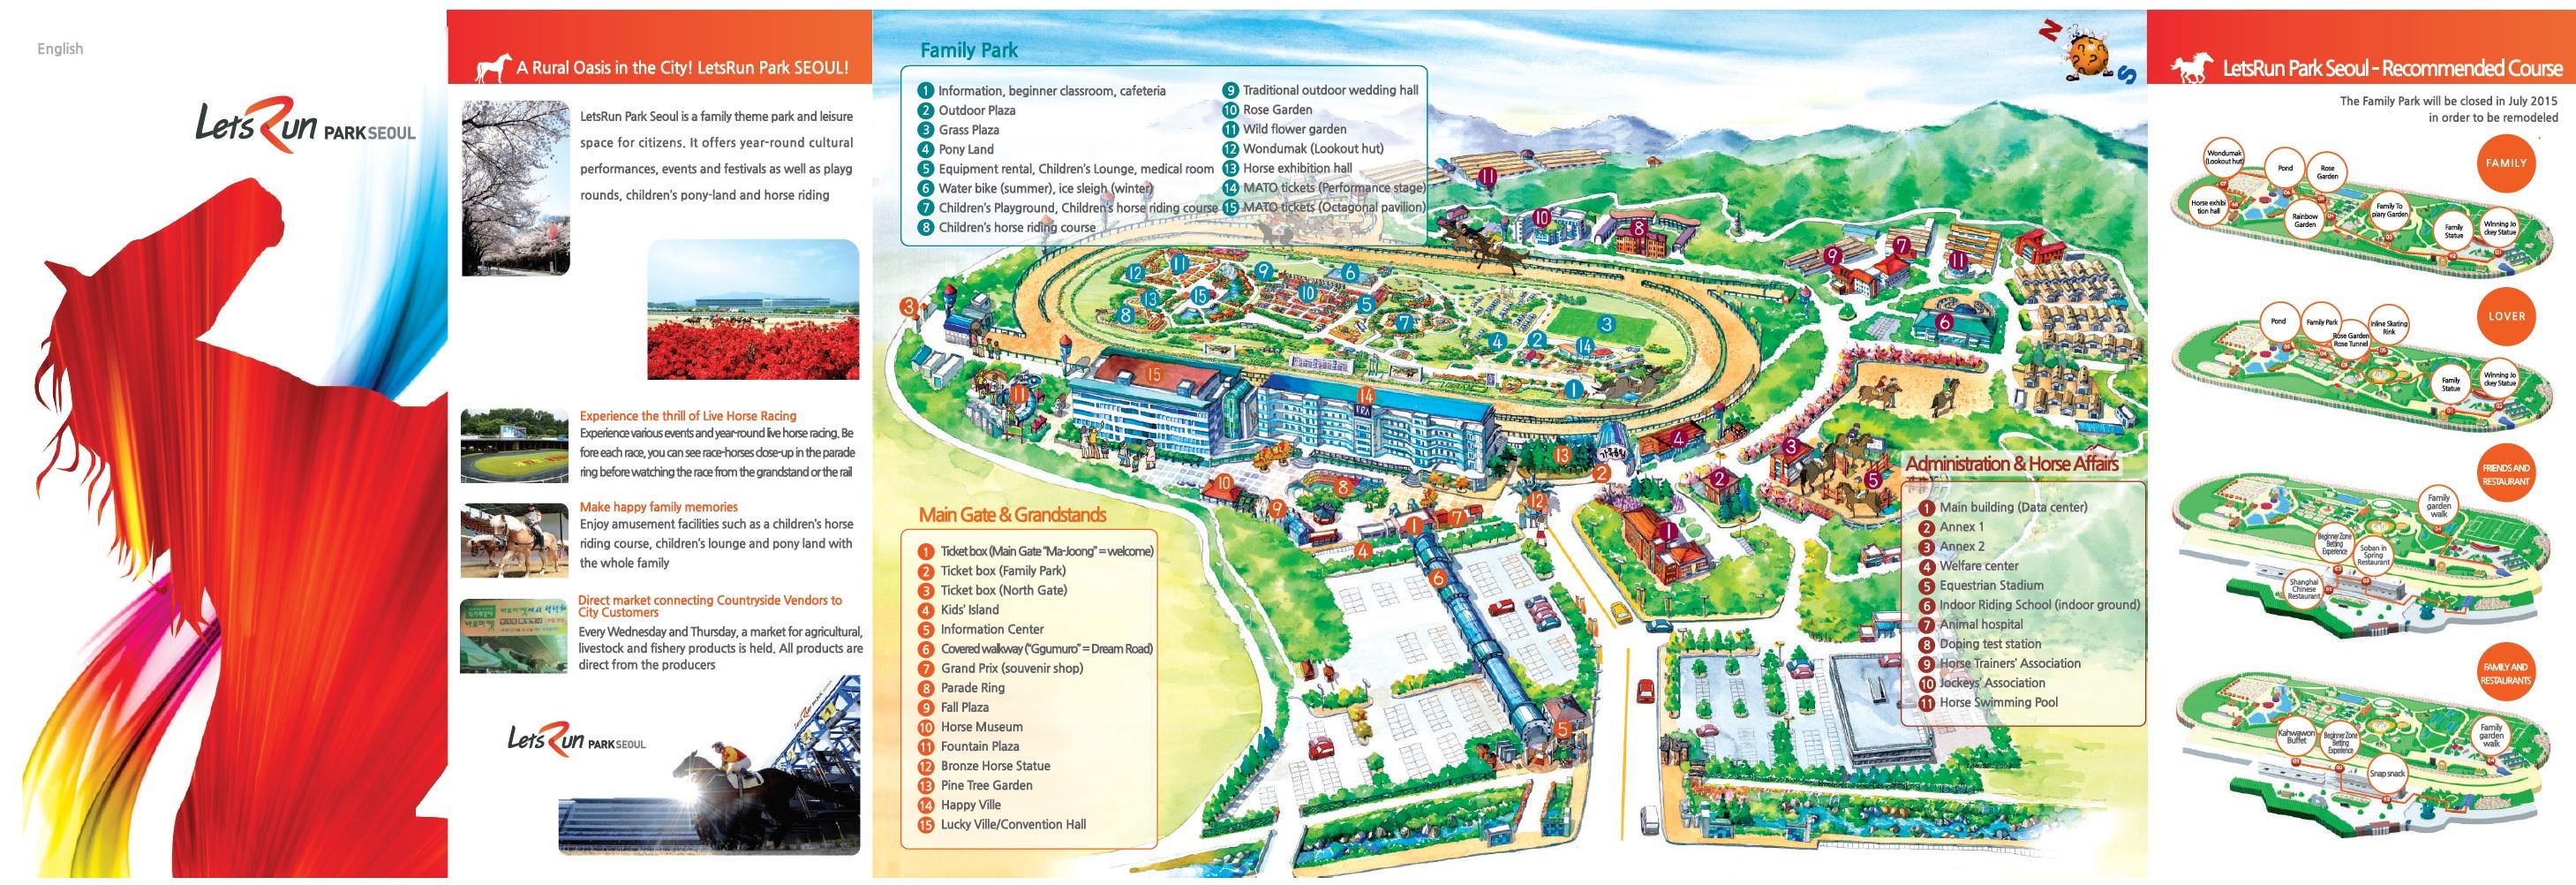 Let's Run Park Seoul Brochure English 2